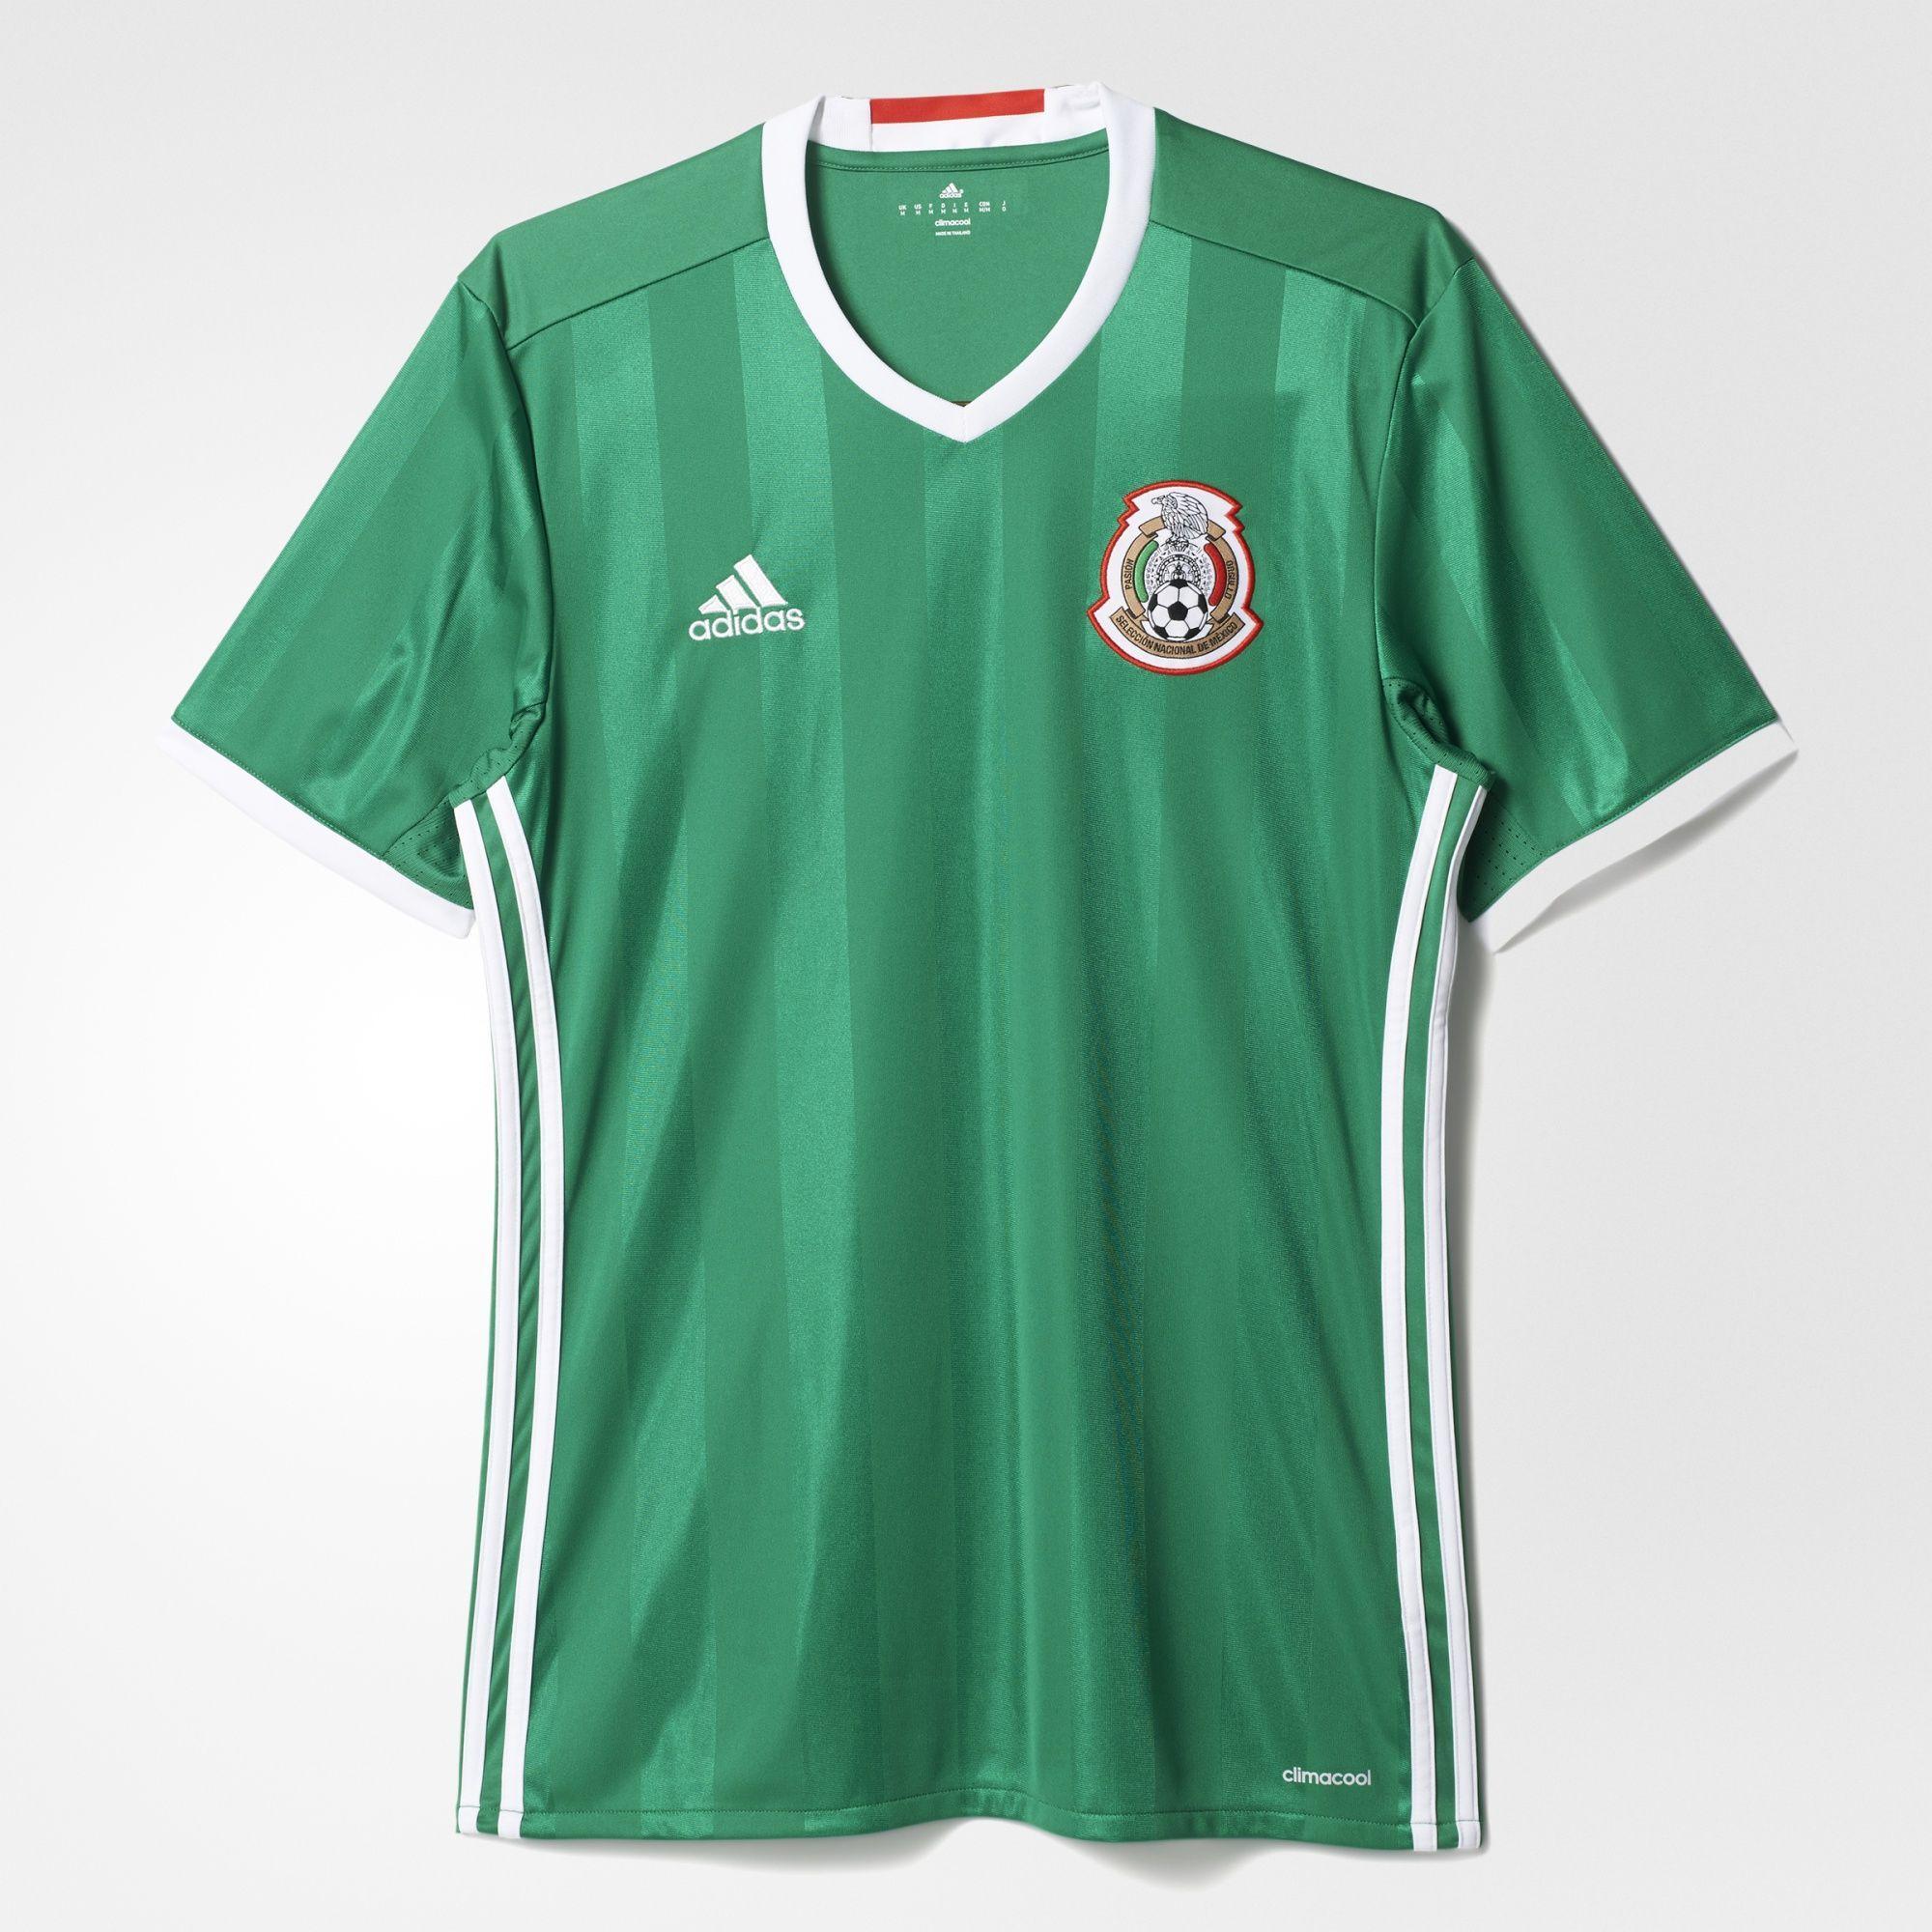 adidas CAMISETA DE LA SELECCIÓN DE MÉXICO |